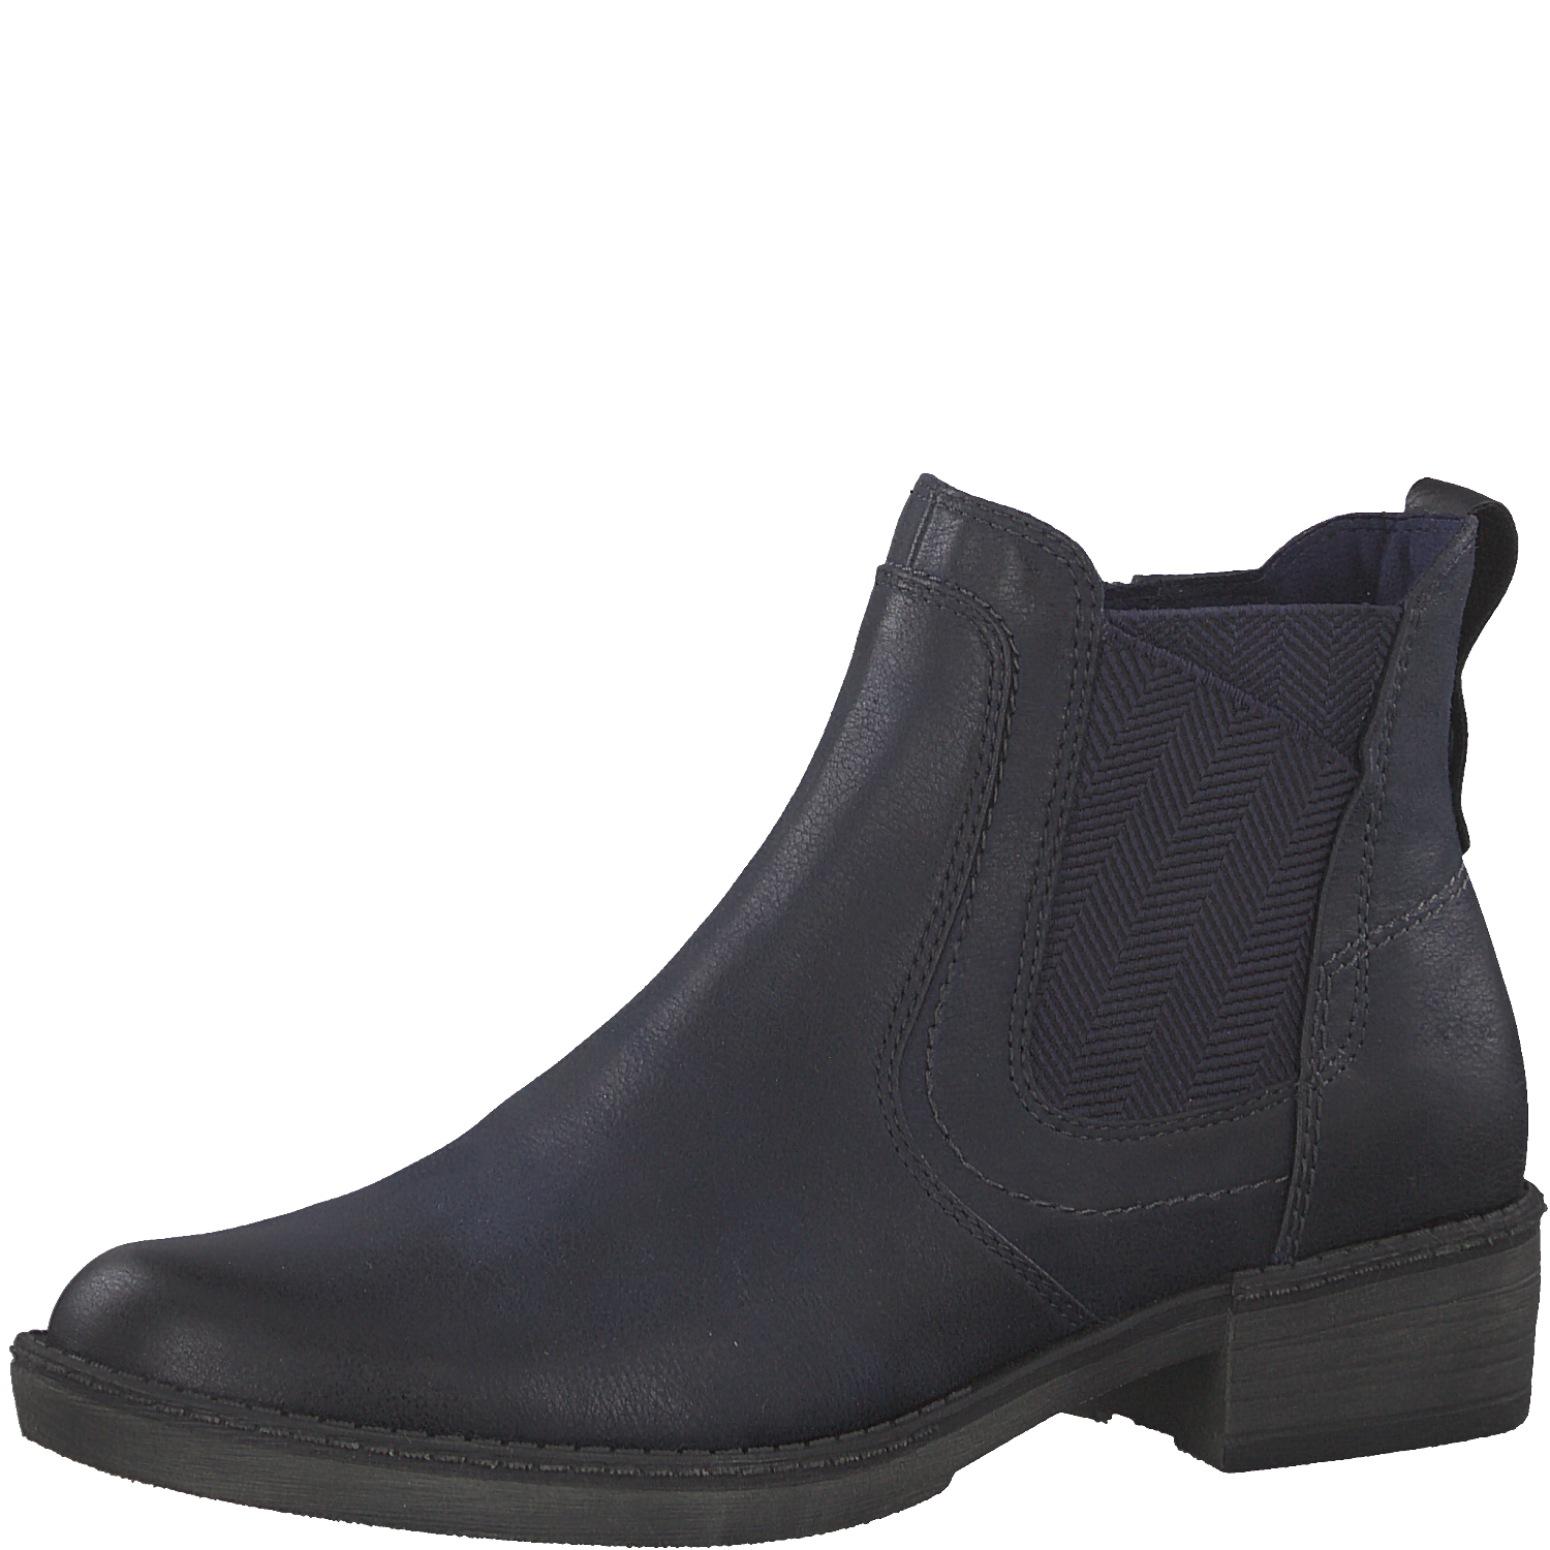 outlet erster Blick populärer Stil Tamaris Damen Stiefelette / Chelsea Boots 1-25309-21-805 navy blau | Schuhe  direkt vom Schuhhändler